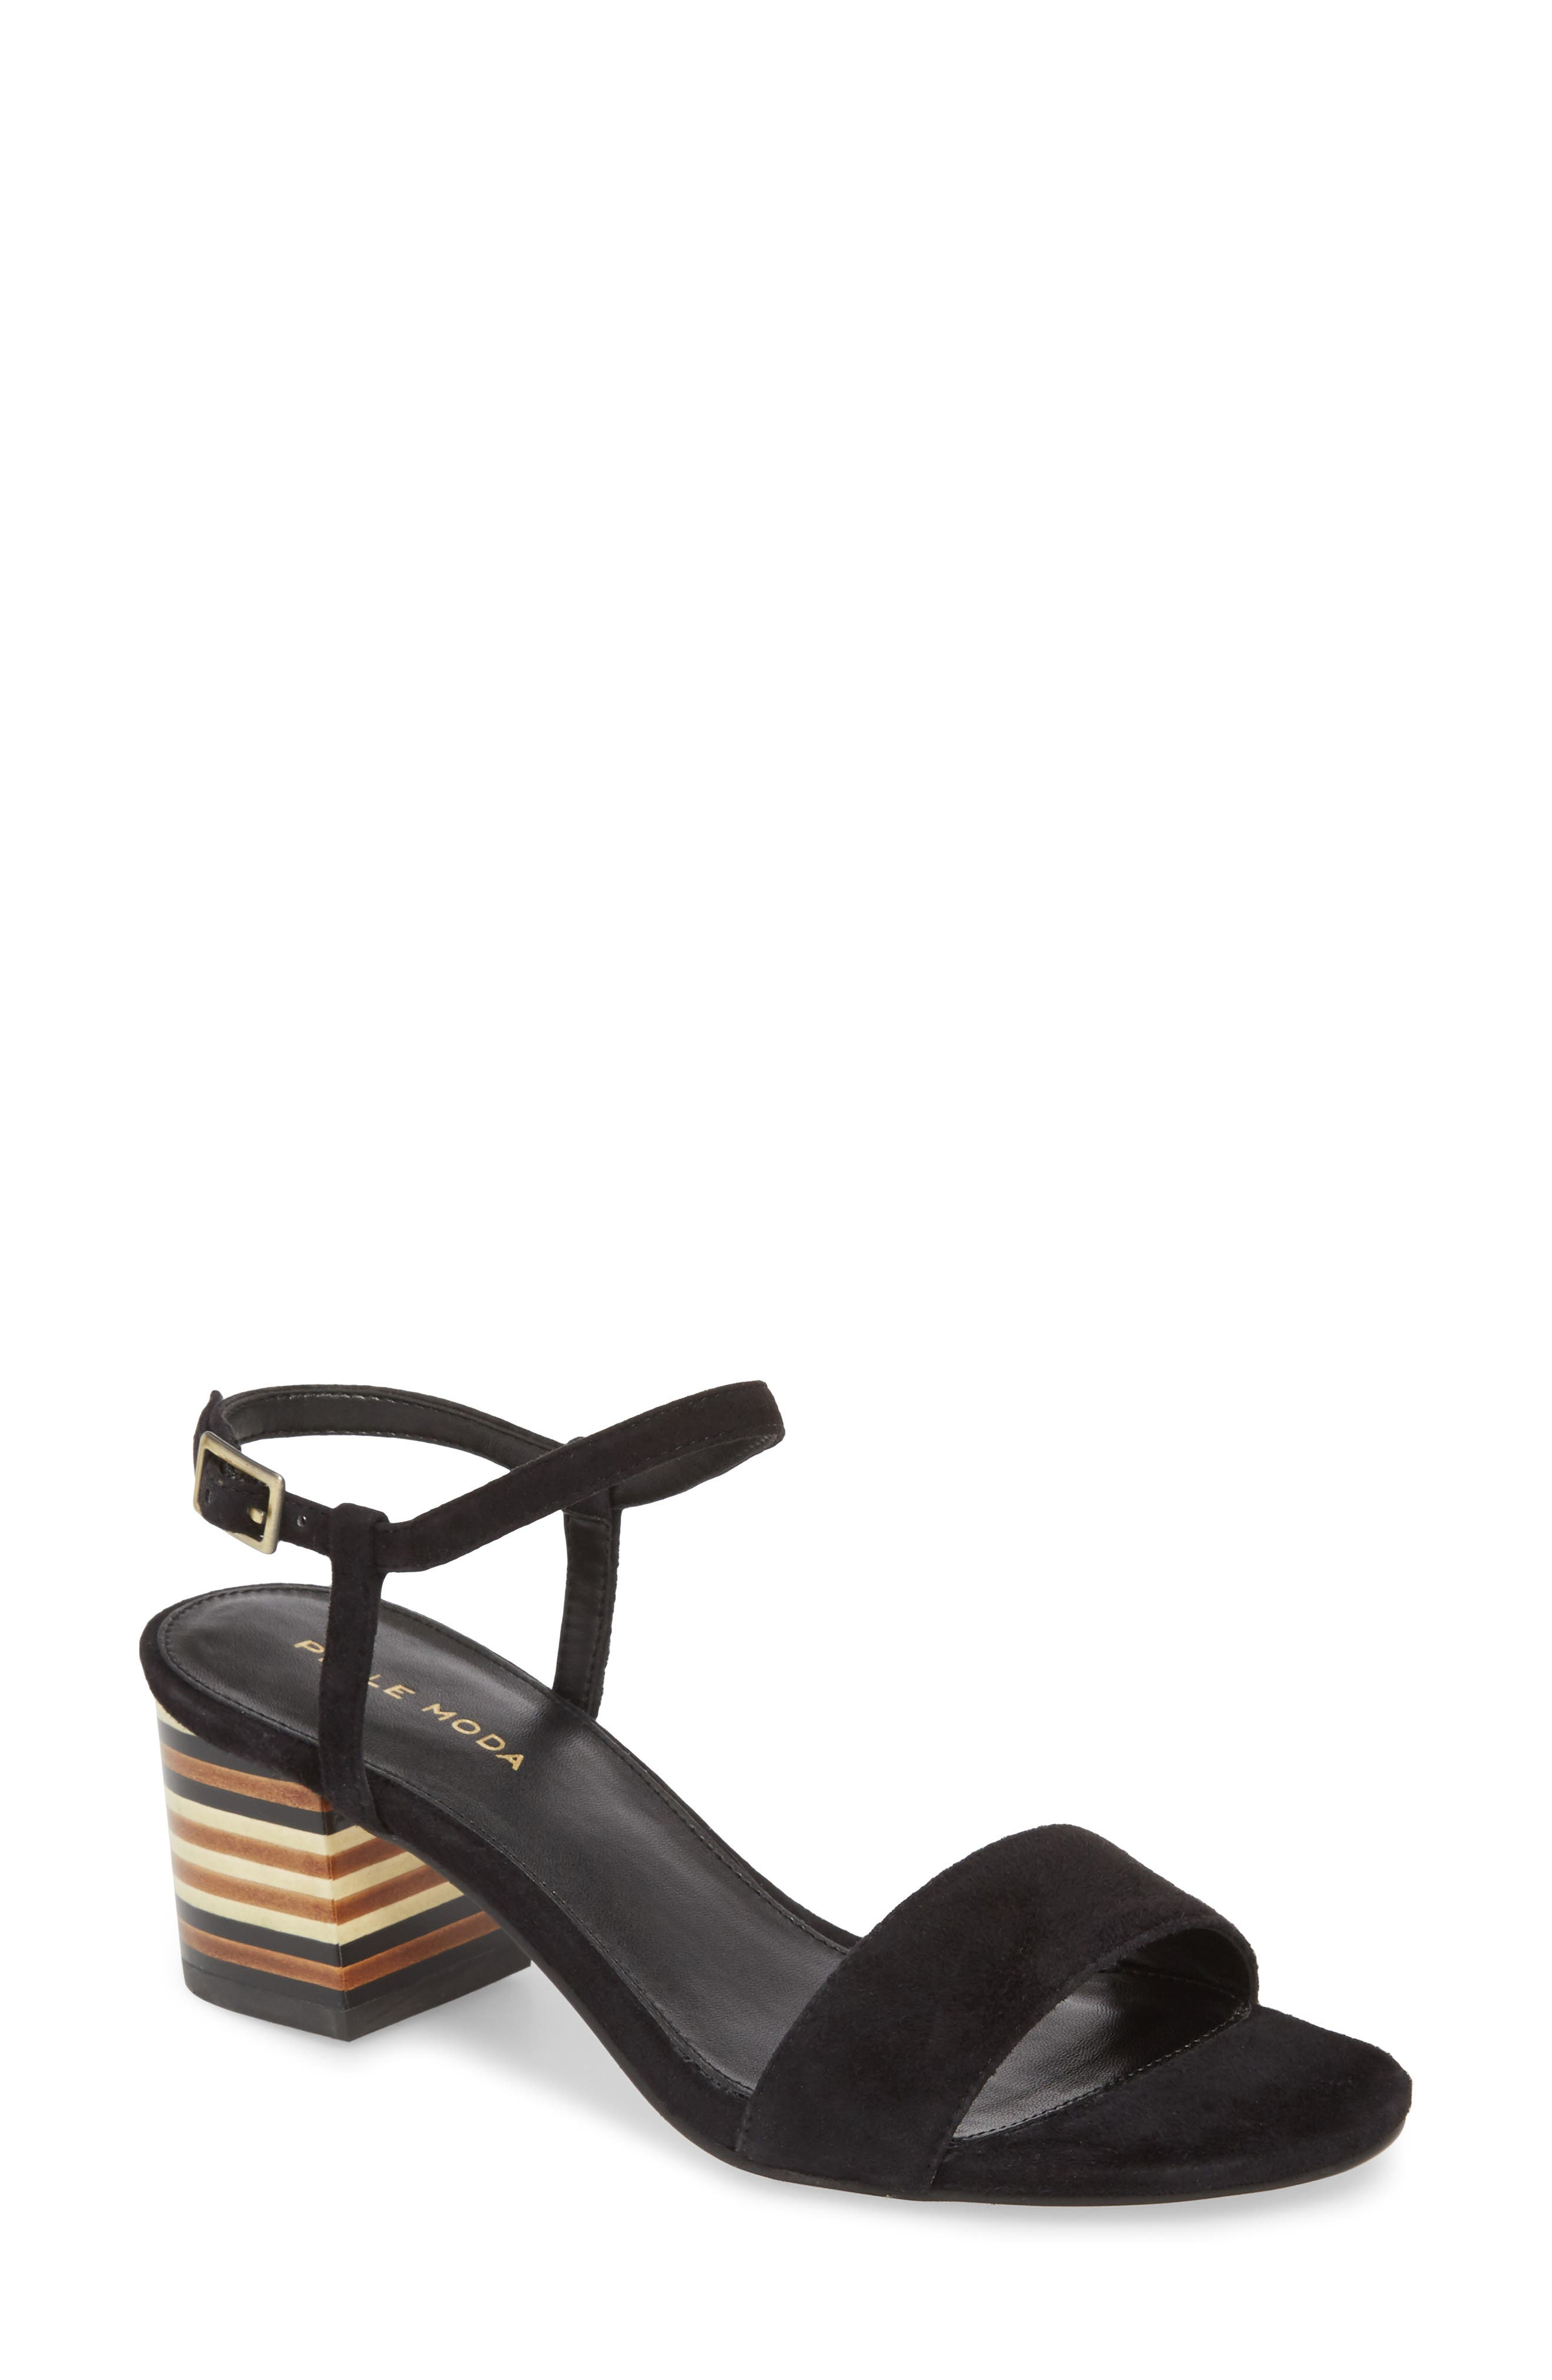 Alicia Block Heel Sandal,                             Main thumbnail 1, color,                             BLACK SUEDE